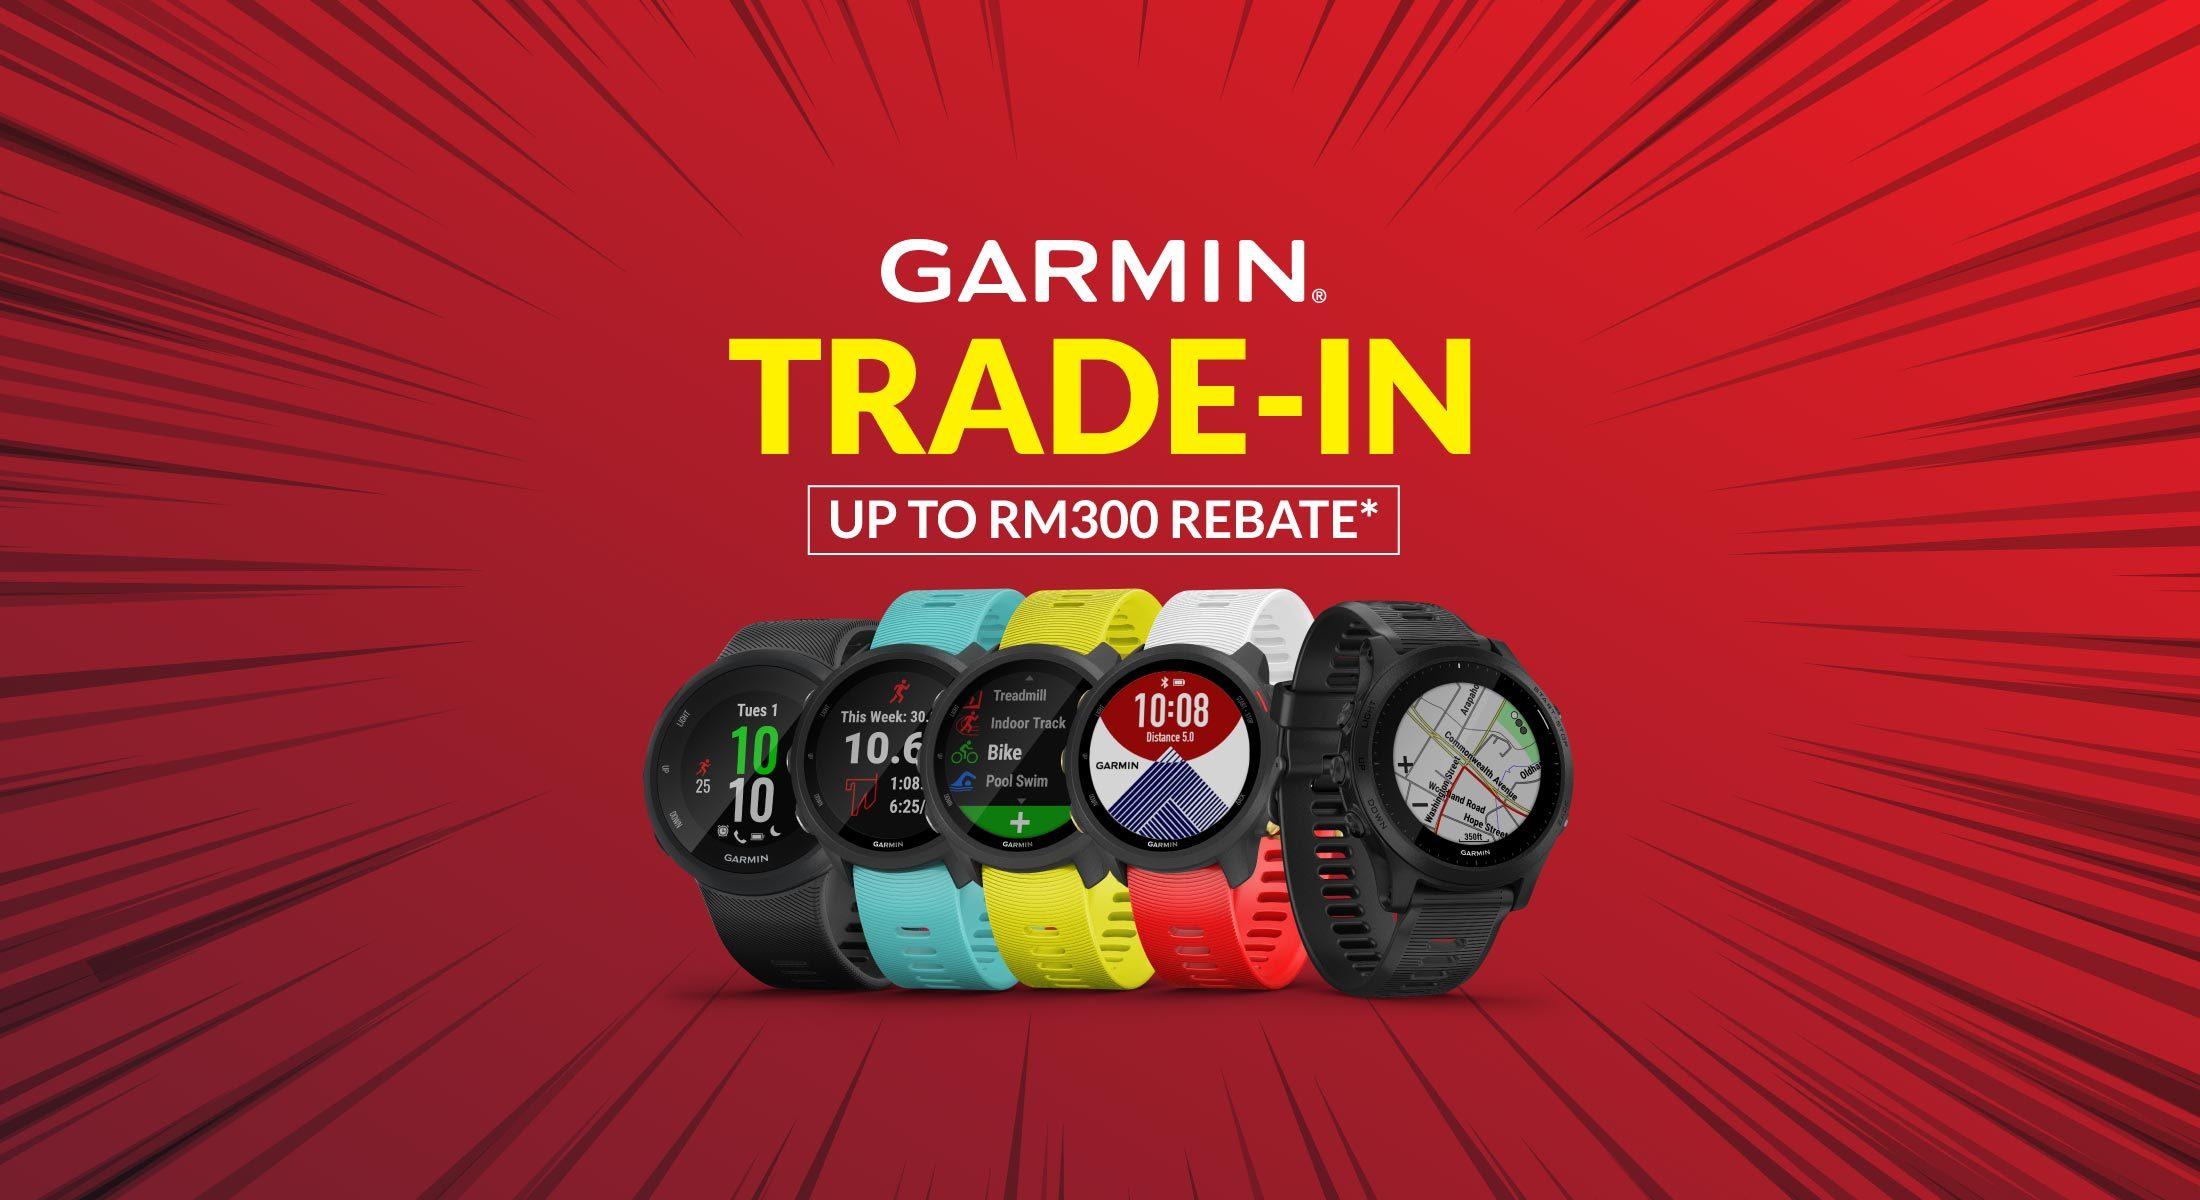 Garmin-Forerunner-Trade-in-Promotion